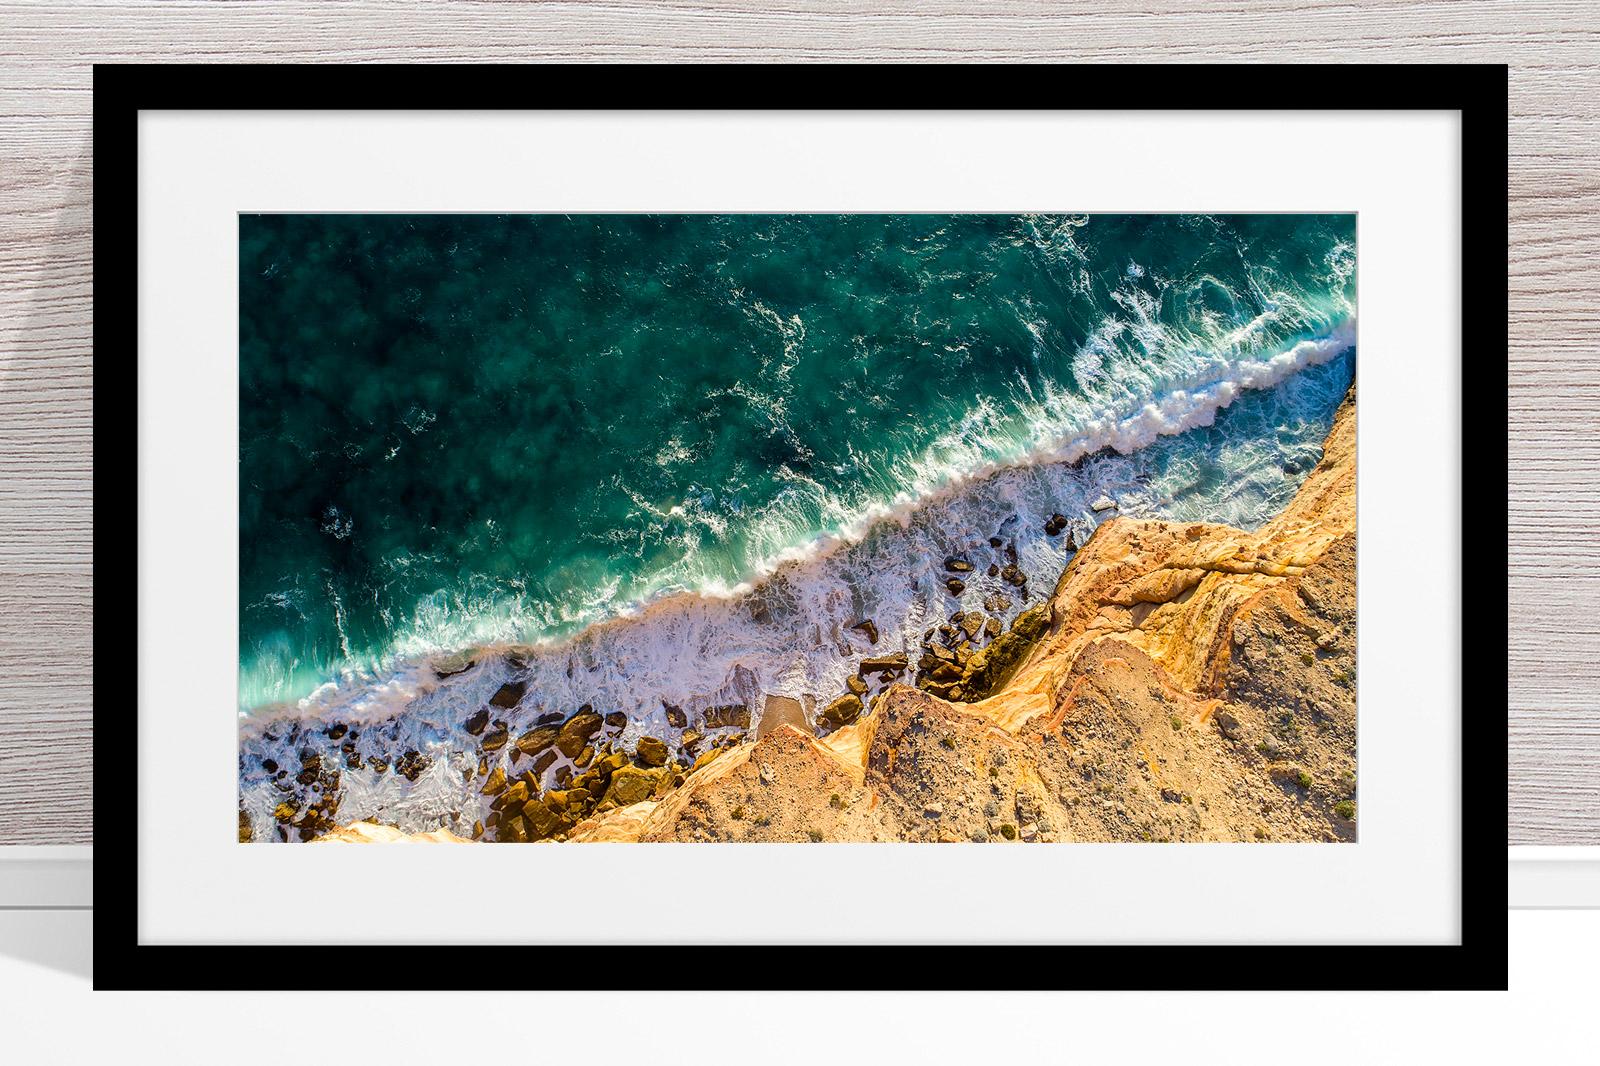 007 - Jason Mazur - Kalbarri Coastline' Black Frame